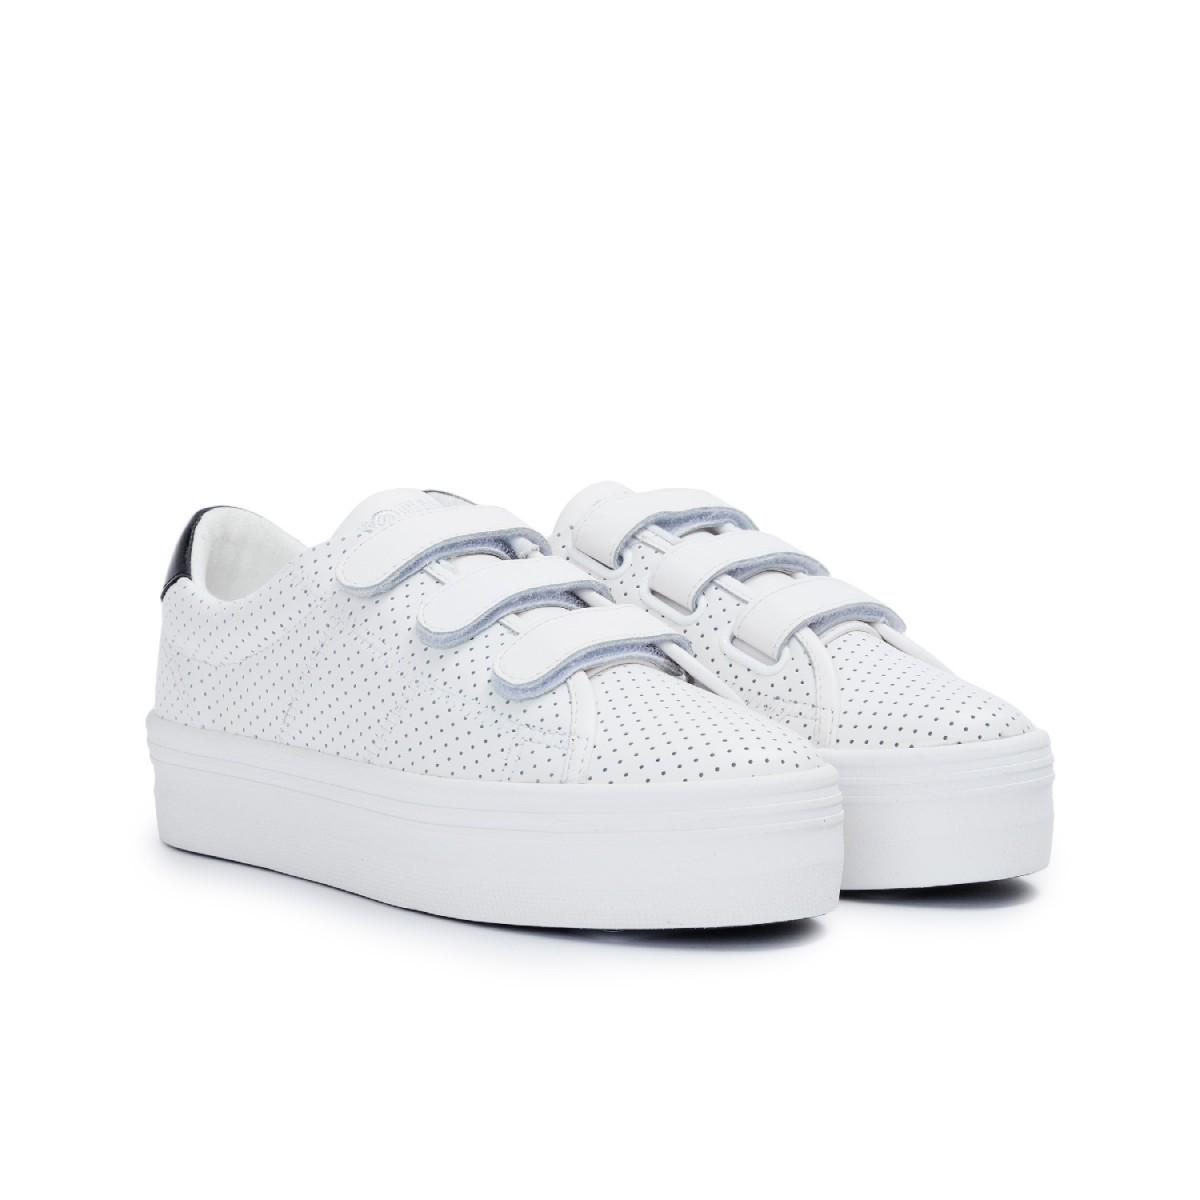 PLATO-11259-WHITE プラト ホワイト